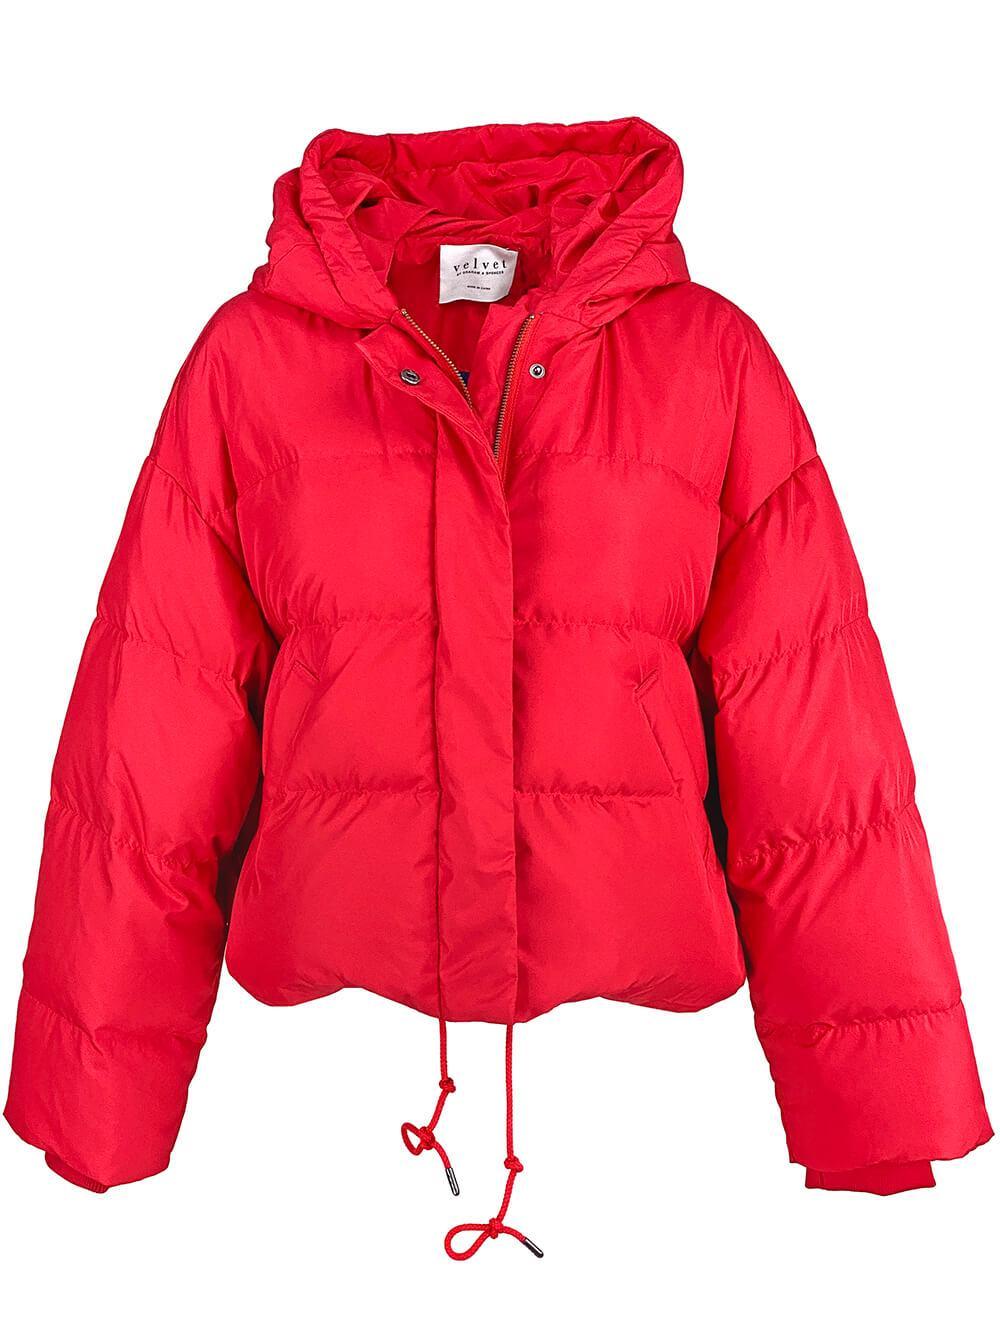 Raylin Puffer Jacket Item # RAYLIN04-F21